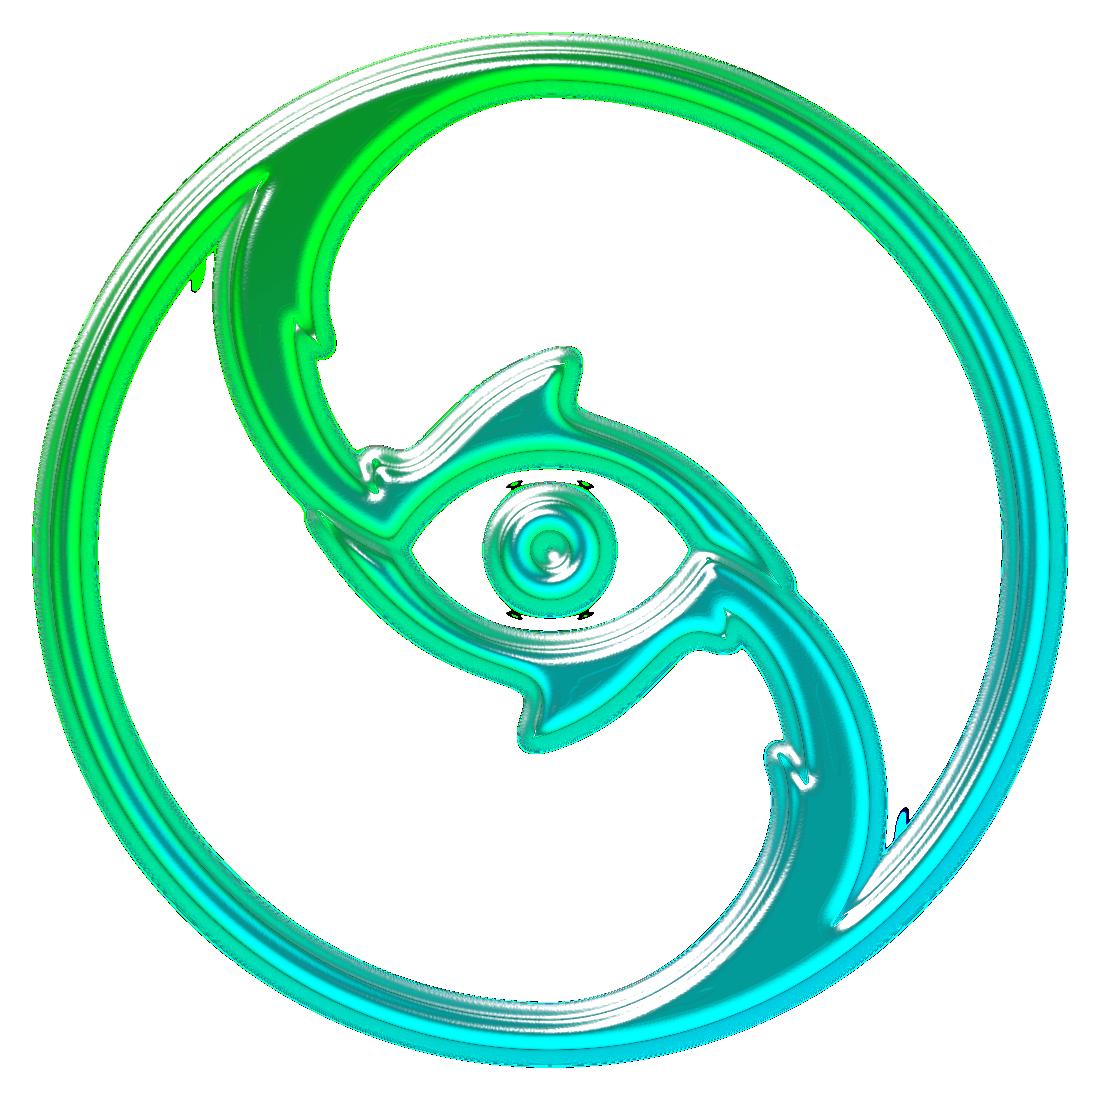 Spectral Eye New Ver By Kriss80858 On Deviantart